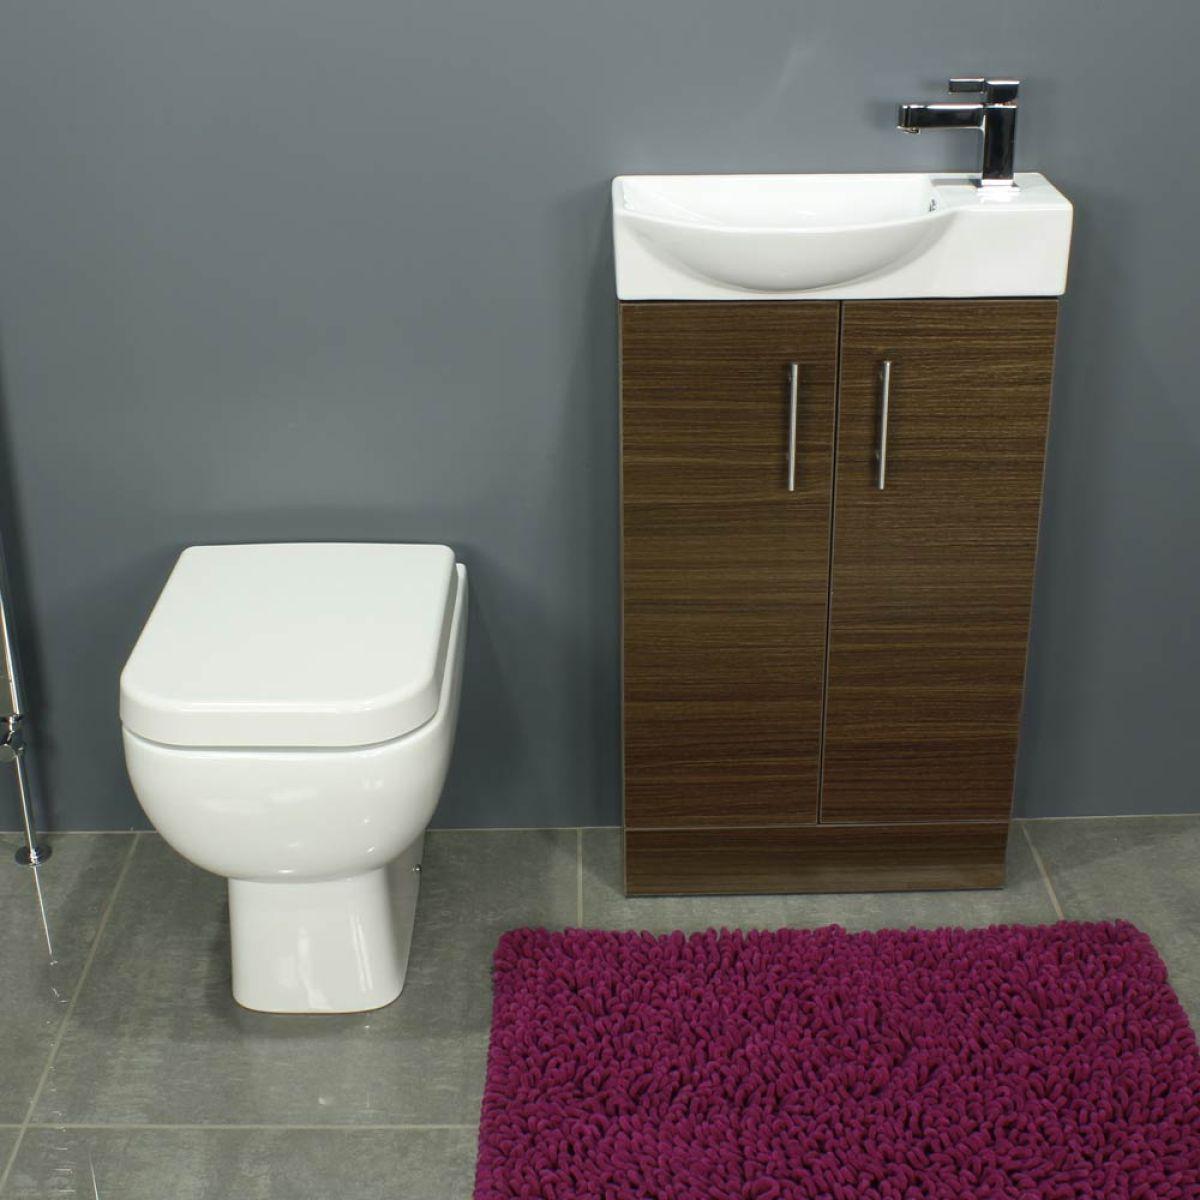 RAK Series 600 Back To Wall Toilet and 500 Series Walnut Mini Double Door Vanity Unit Front